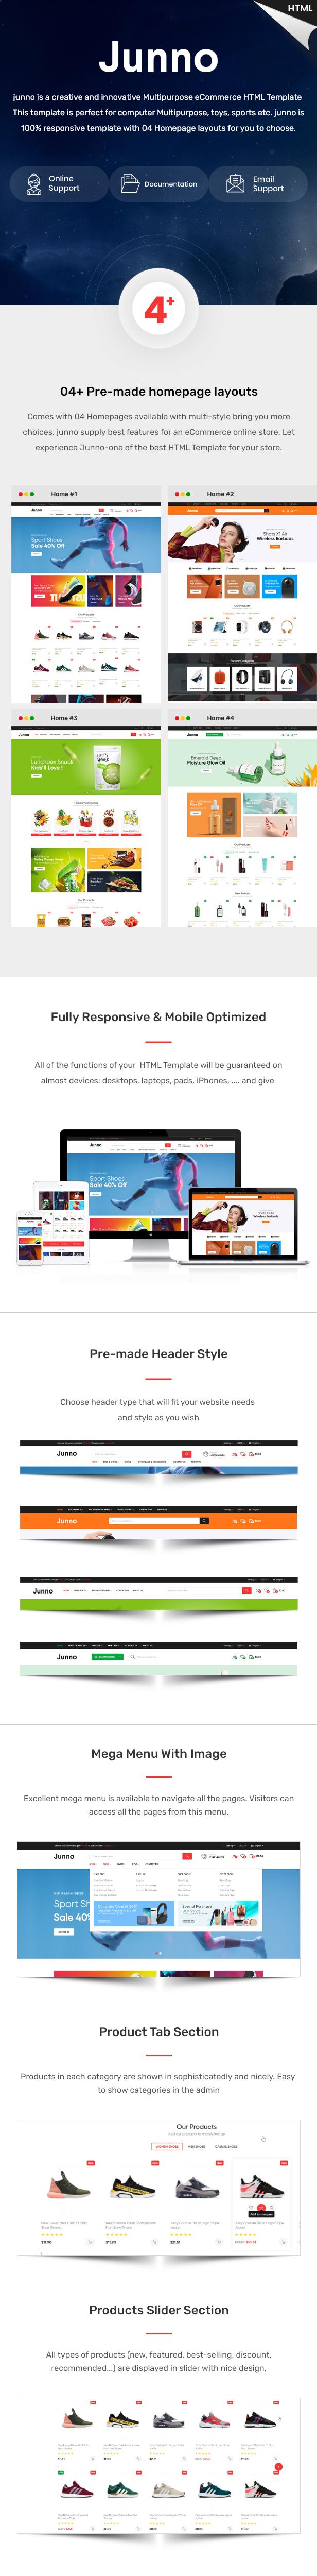 Junno – Multipurpose eCommerce HTML Template - 1